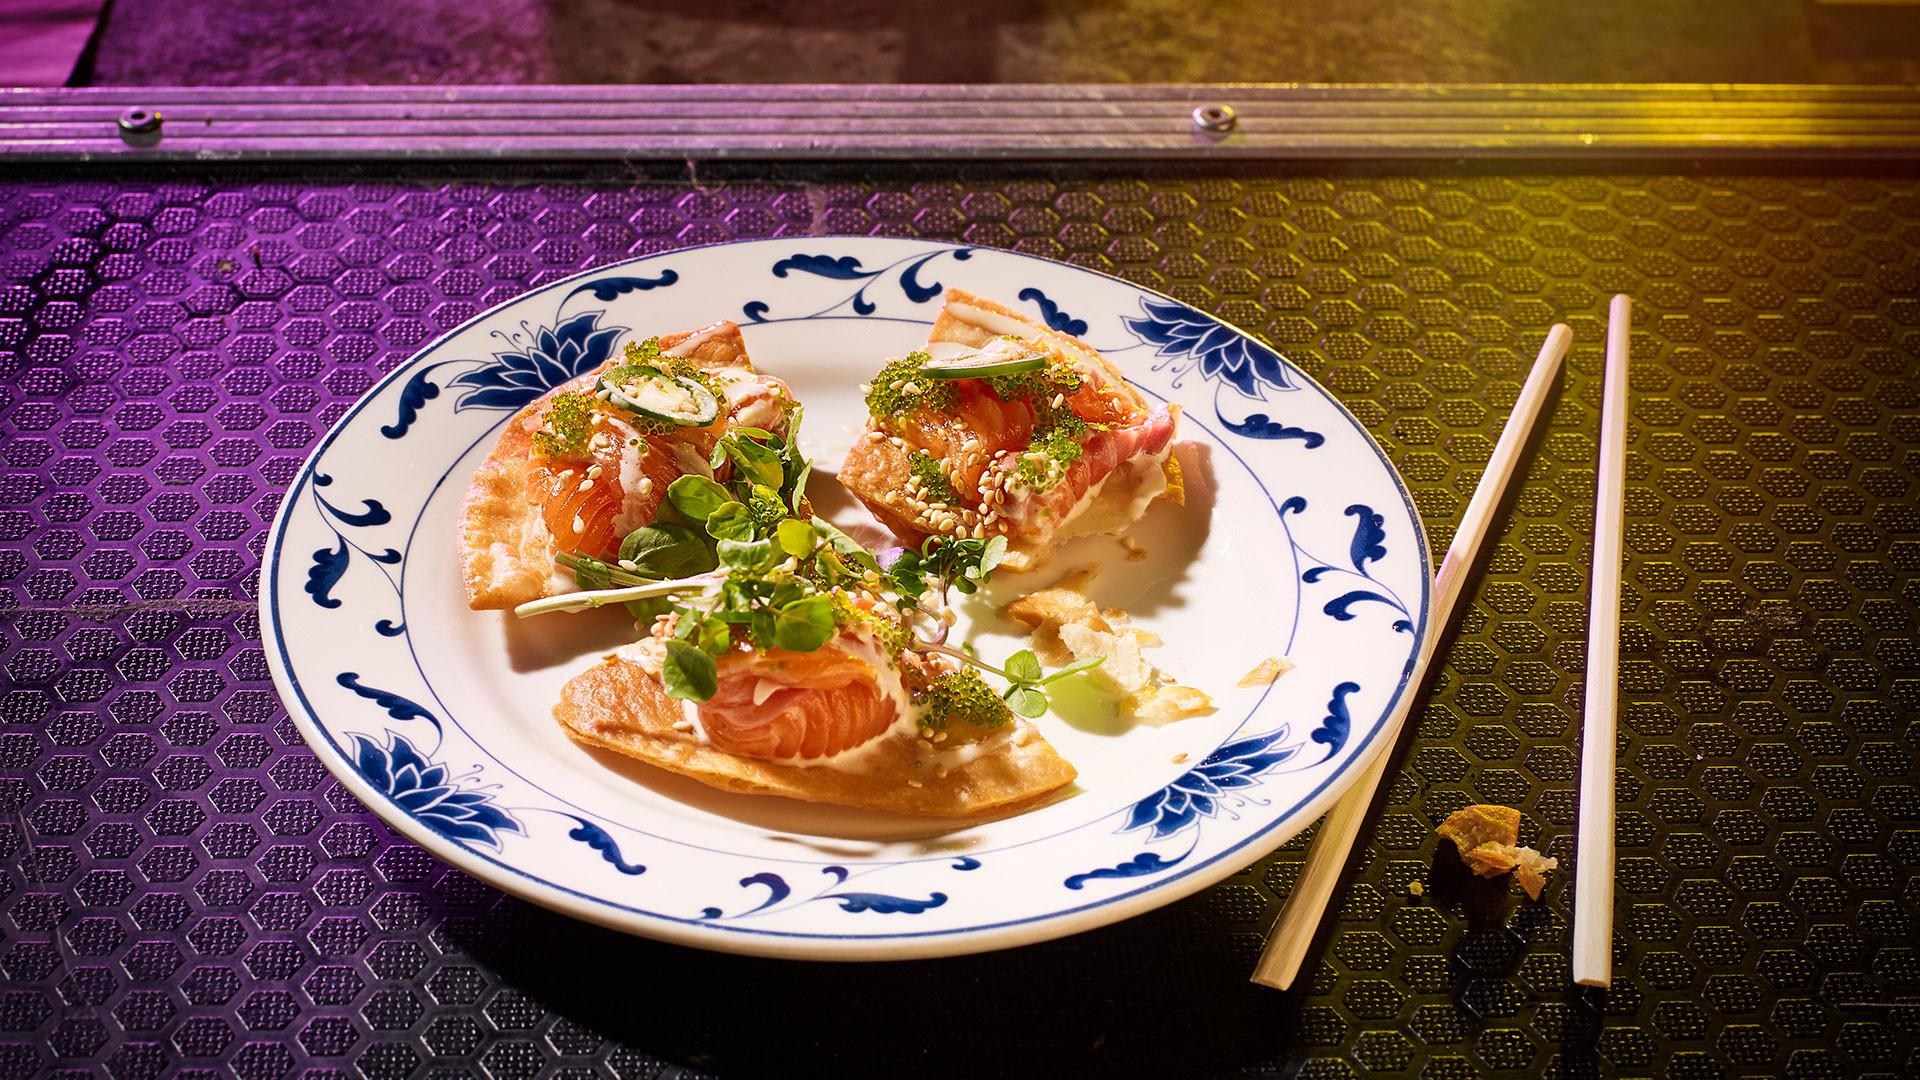 Loch Duart salmon sashimi pizza with truffle ponzu, jalapeno and wasabi tobiko